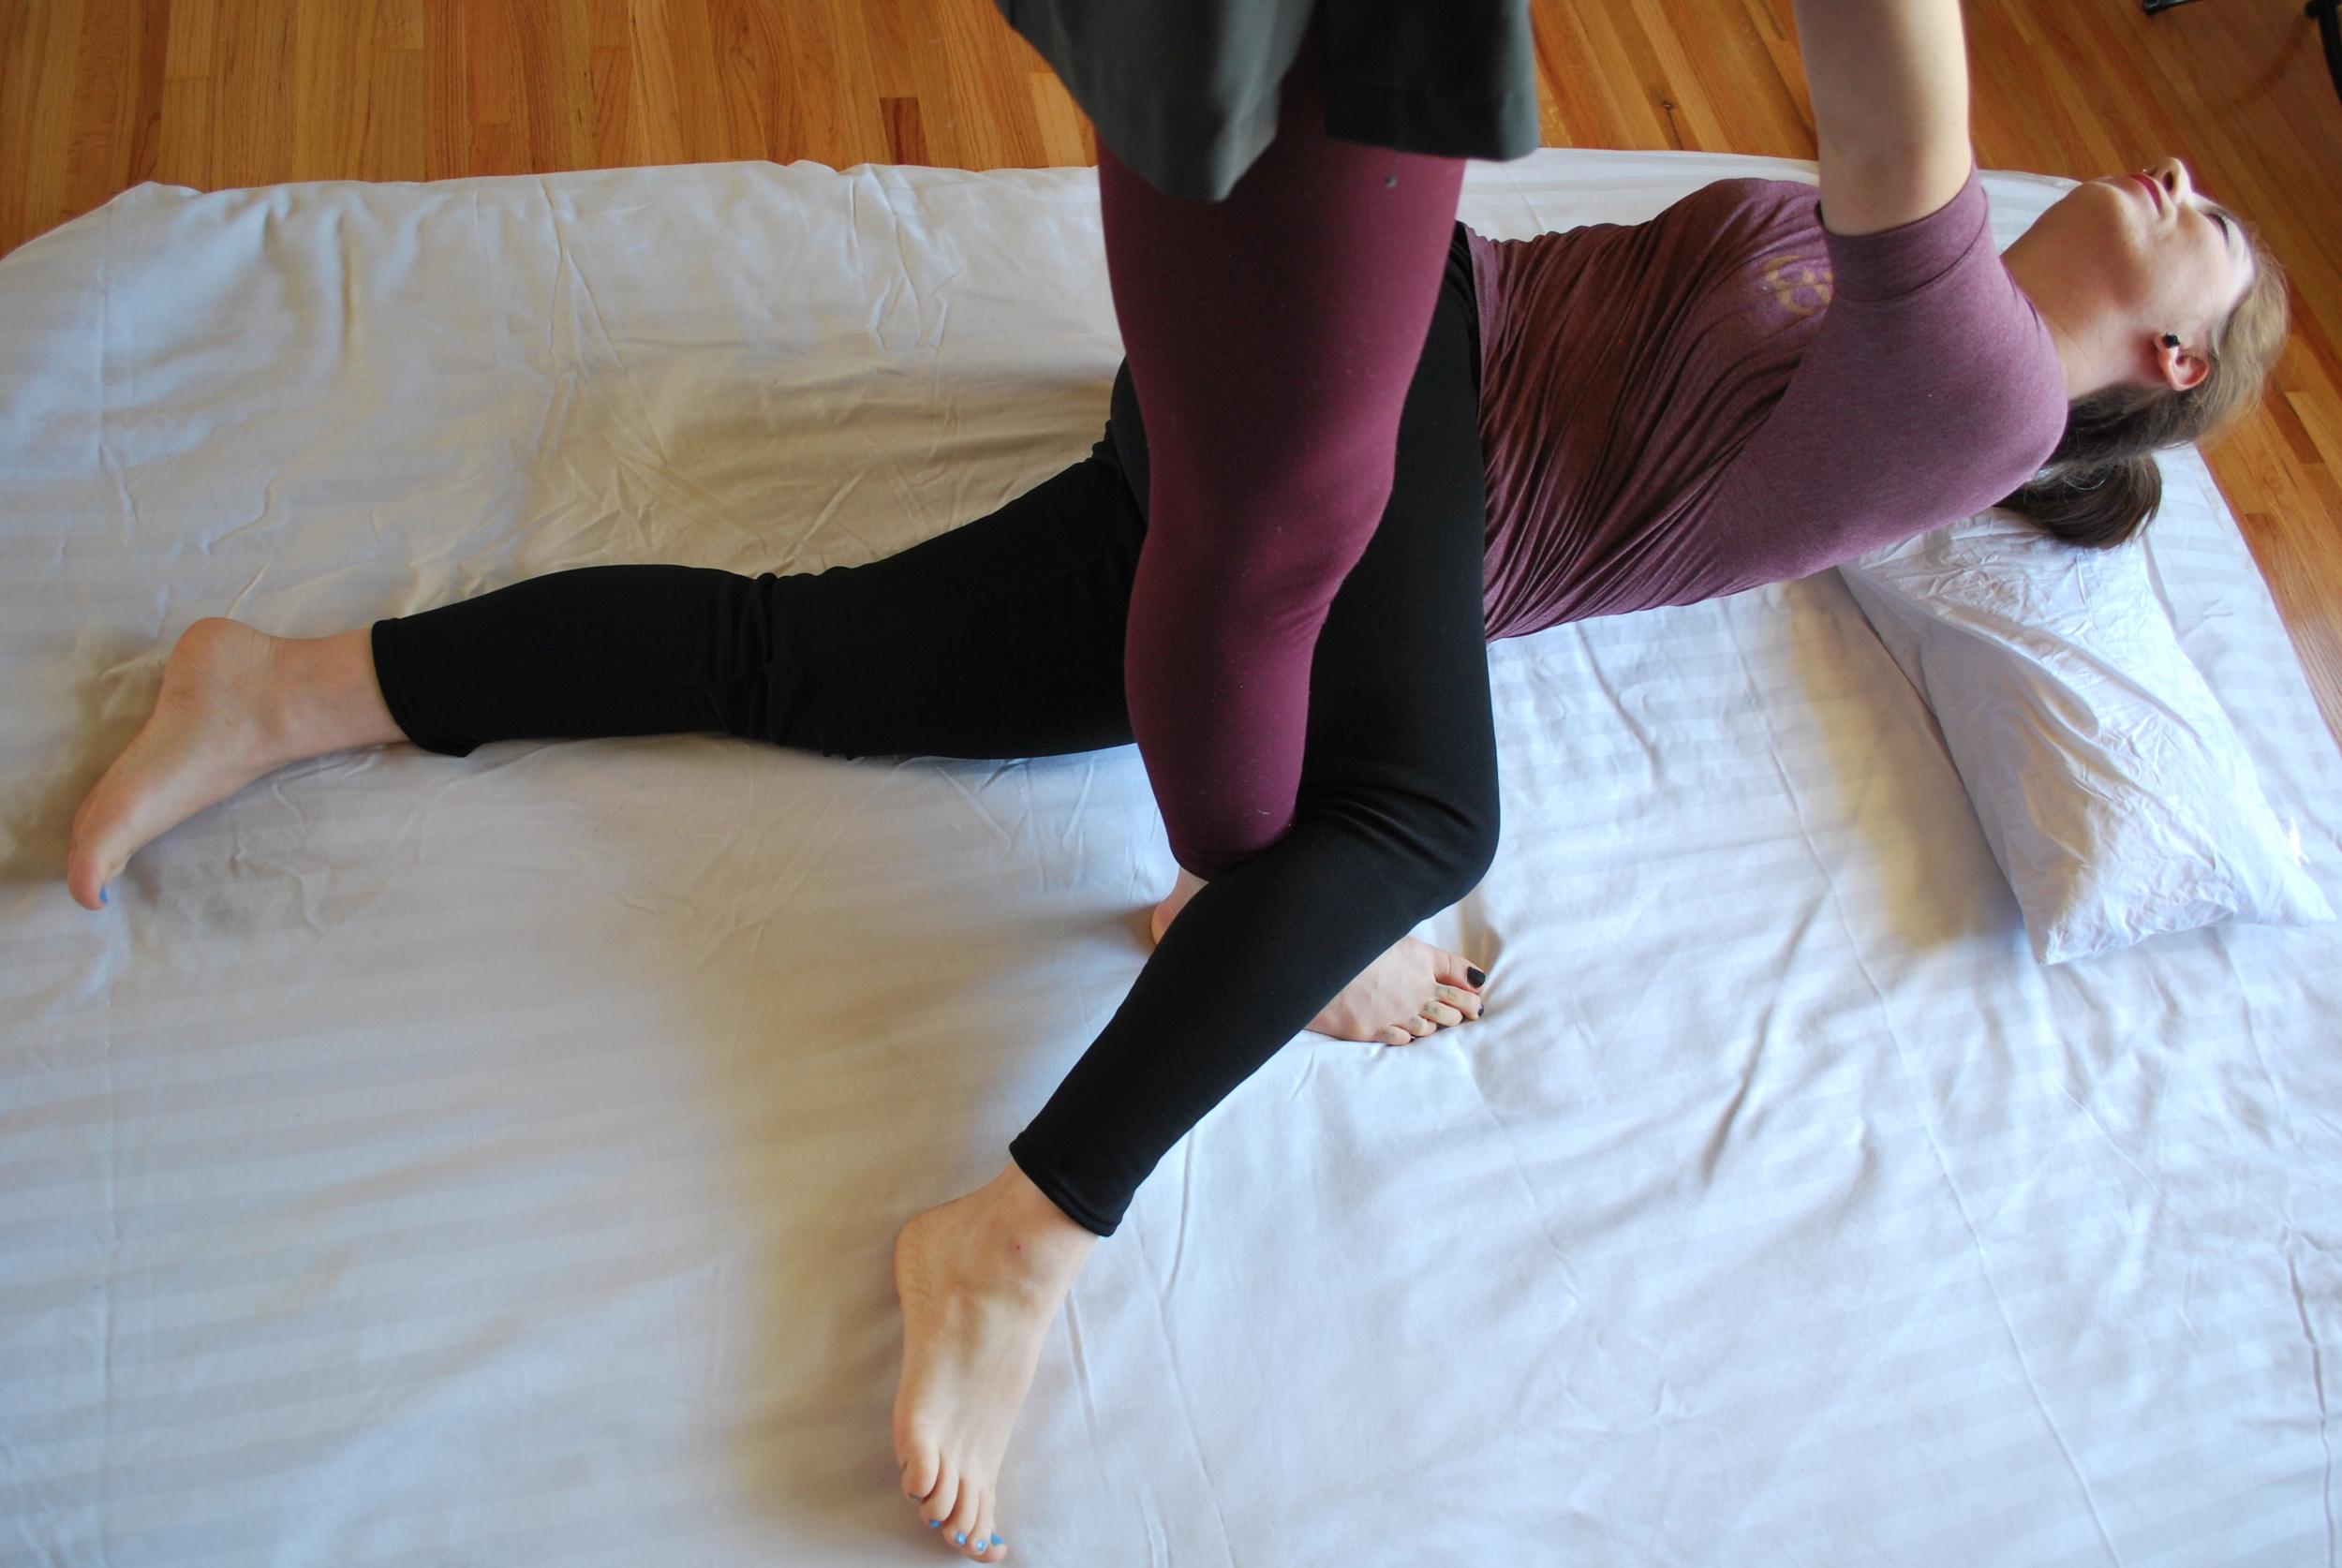 Thai Massage at Samsara Wellness Center: Yoga, Massage & Tattoo in Bakersfield, California